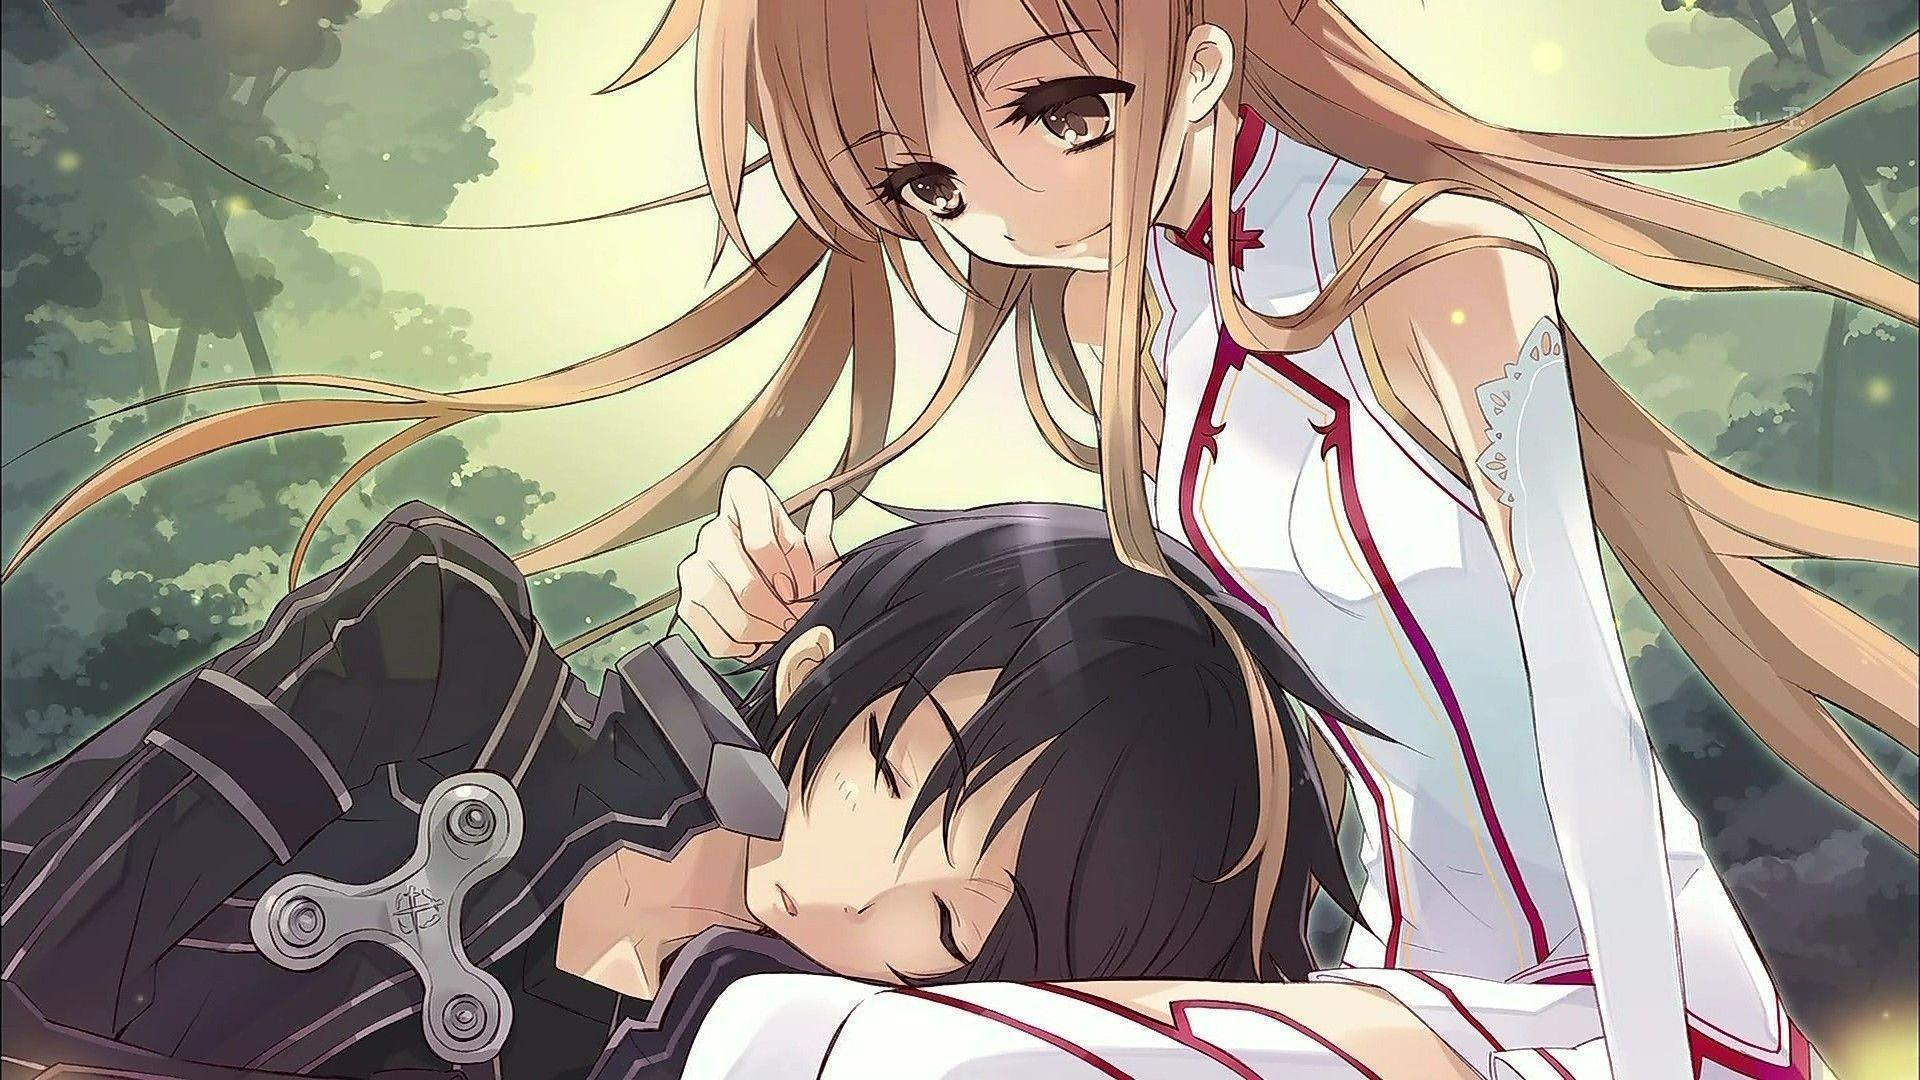 romantic anime photos wallpaper hd 01018 ehiyo com